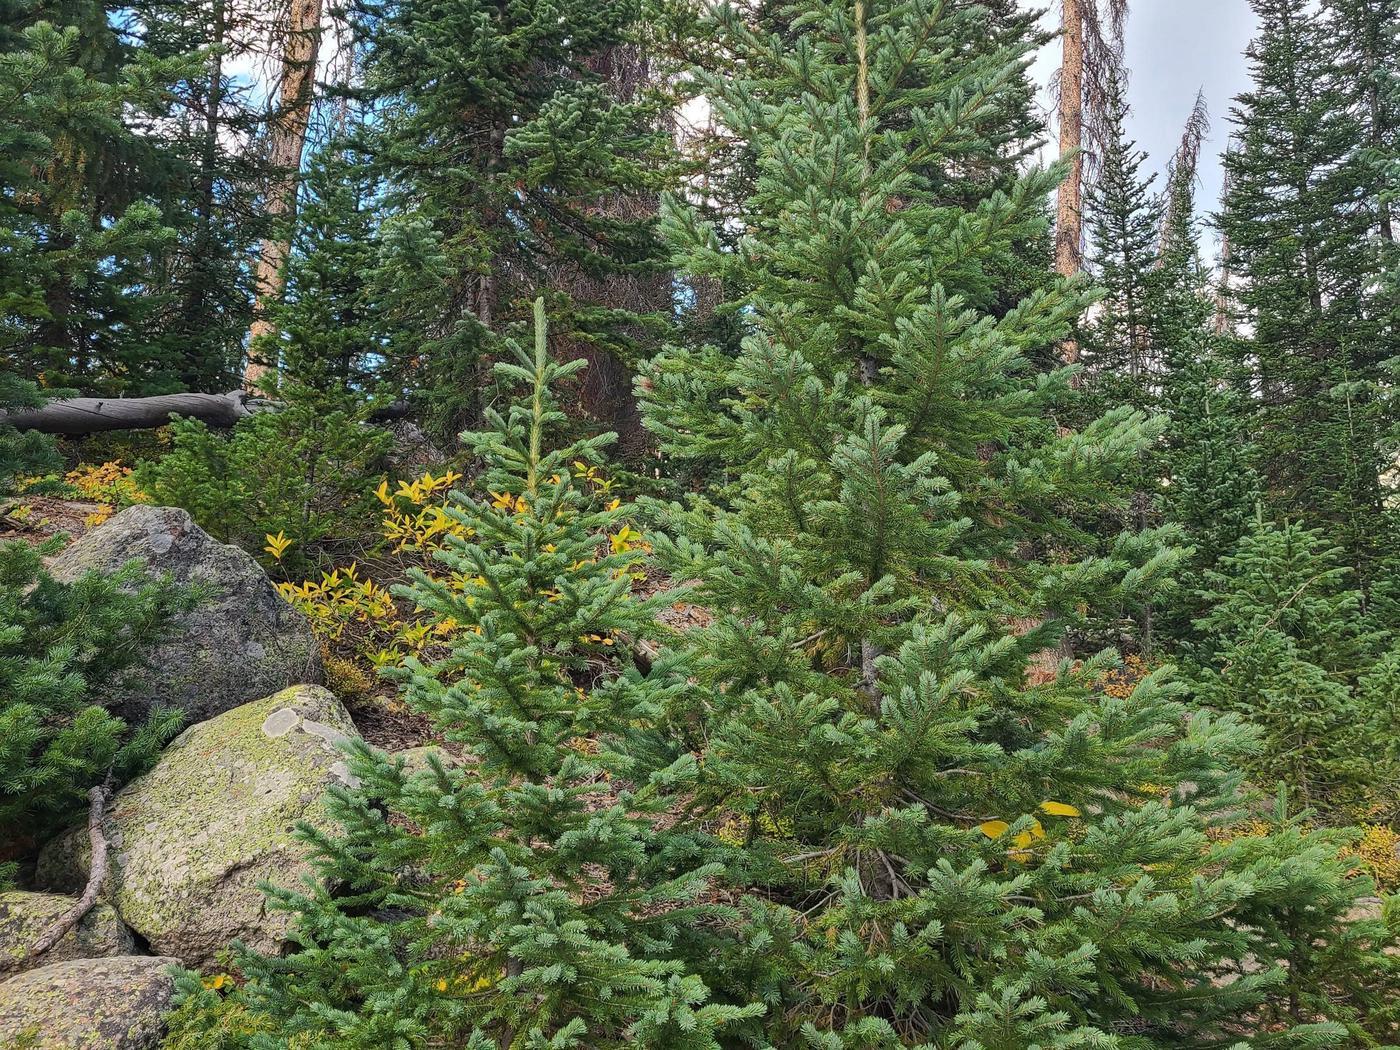 Plumas National Forest Christmas Tree Permits 2020 Plumas National Forest Christmas Tree Permit in California